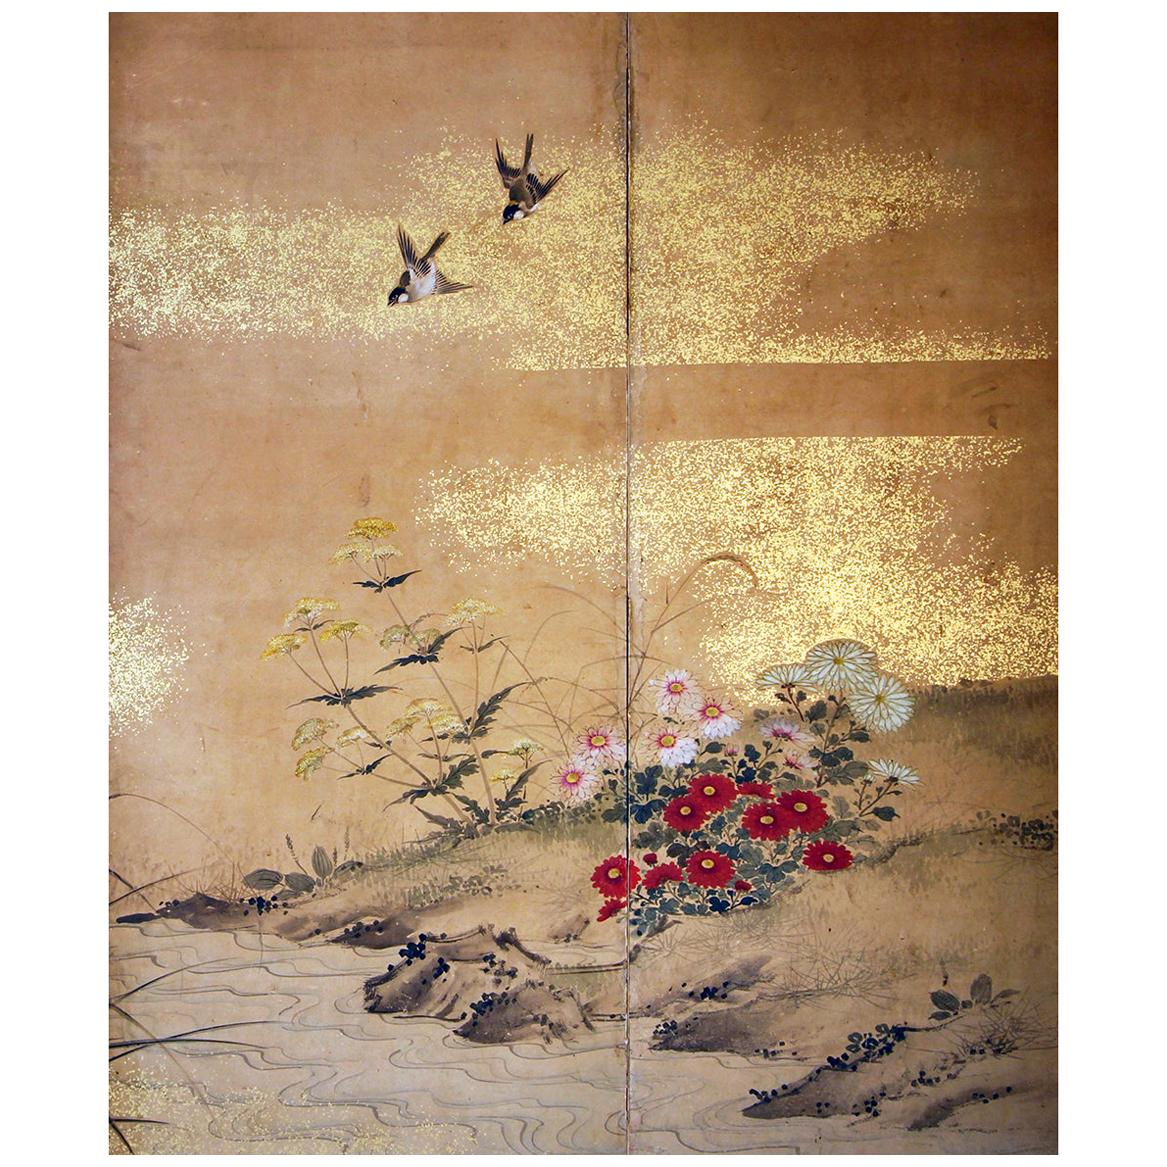 Edo 19th Century, Japanese Folding Screen Six Panels Hand Painted on Rise Paper